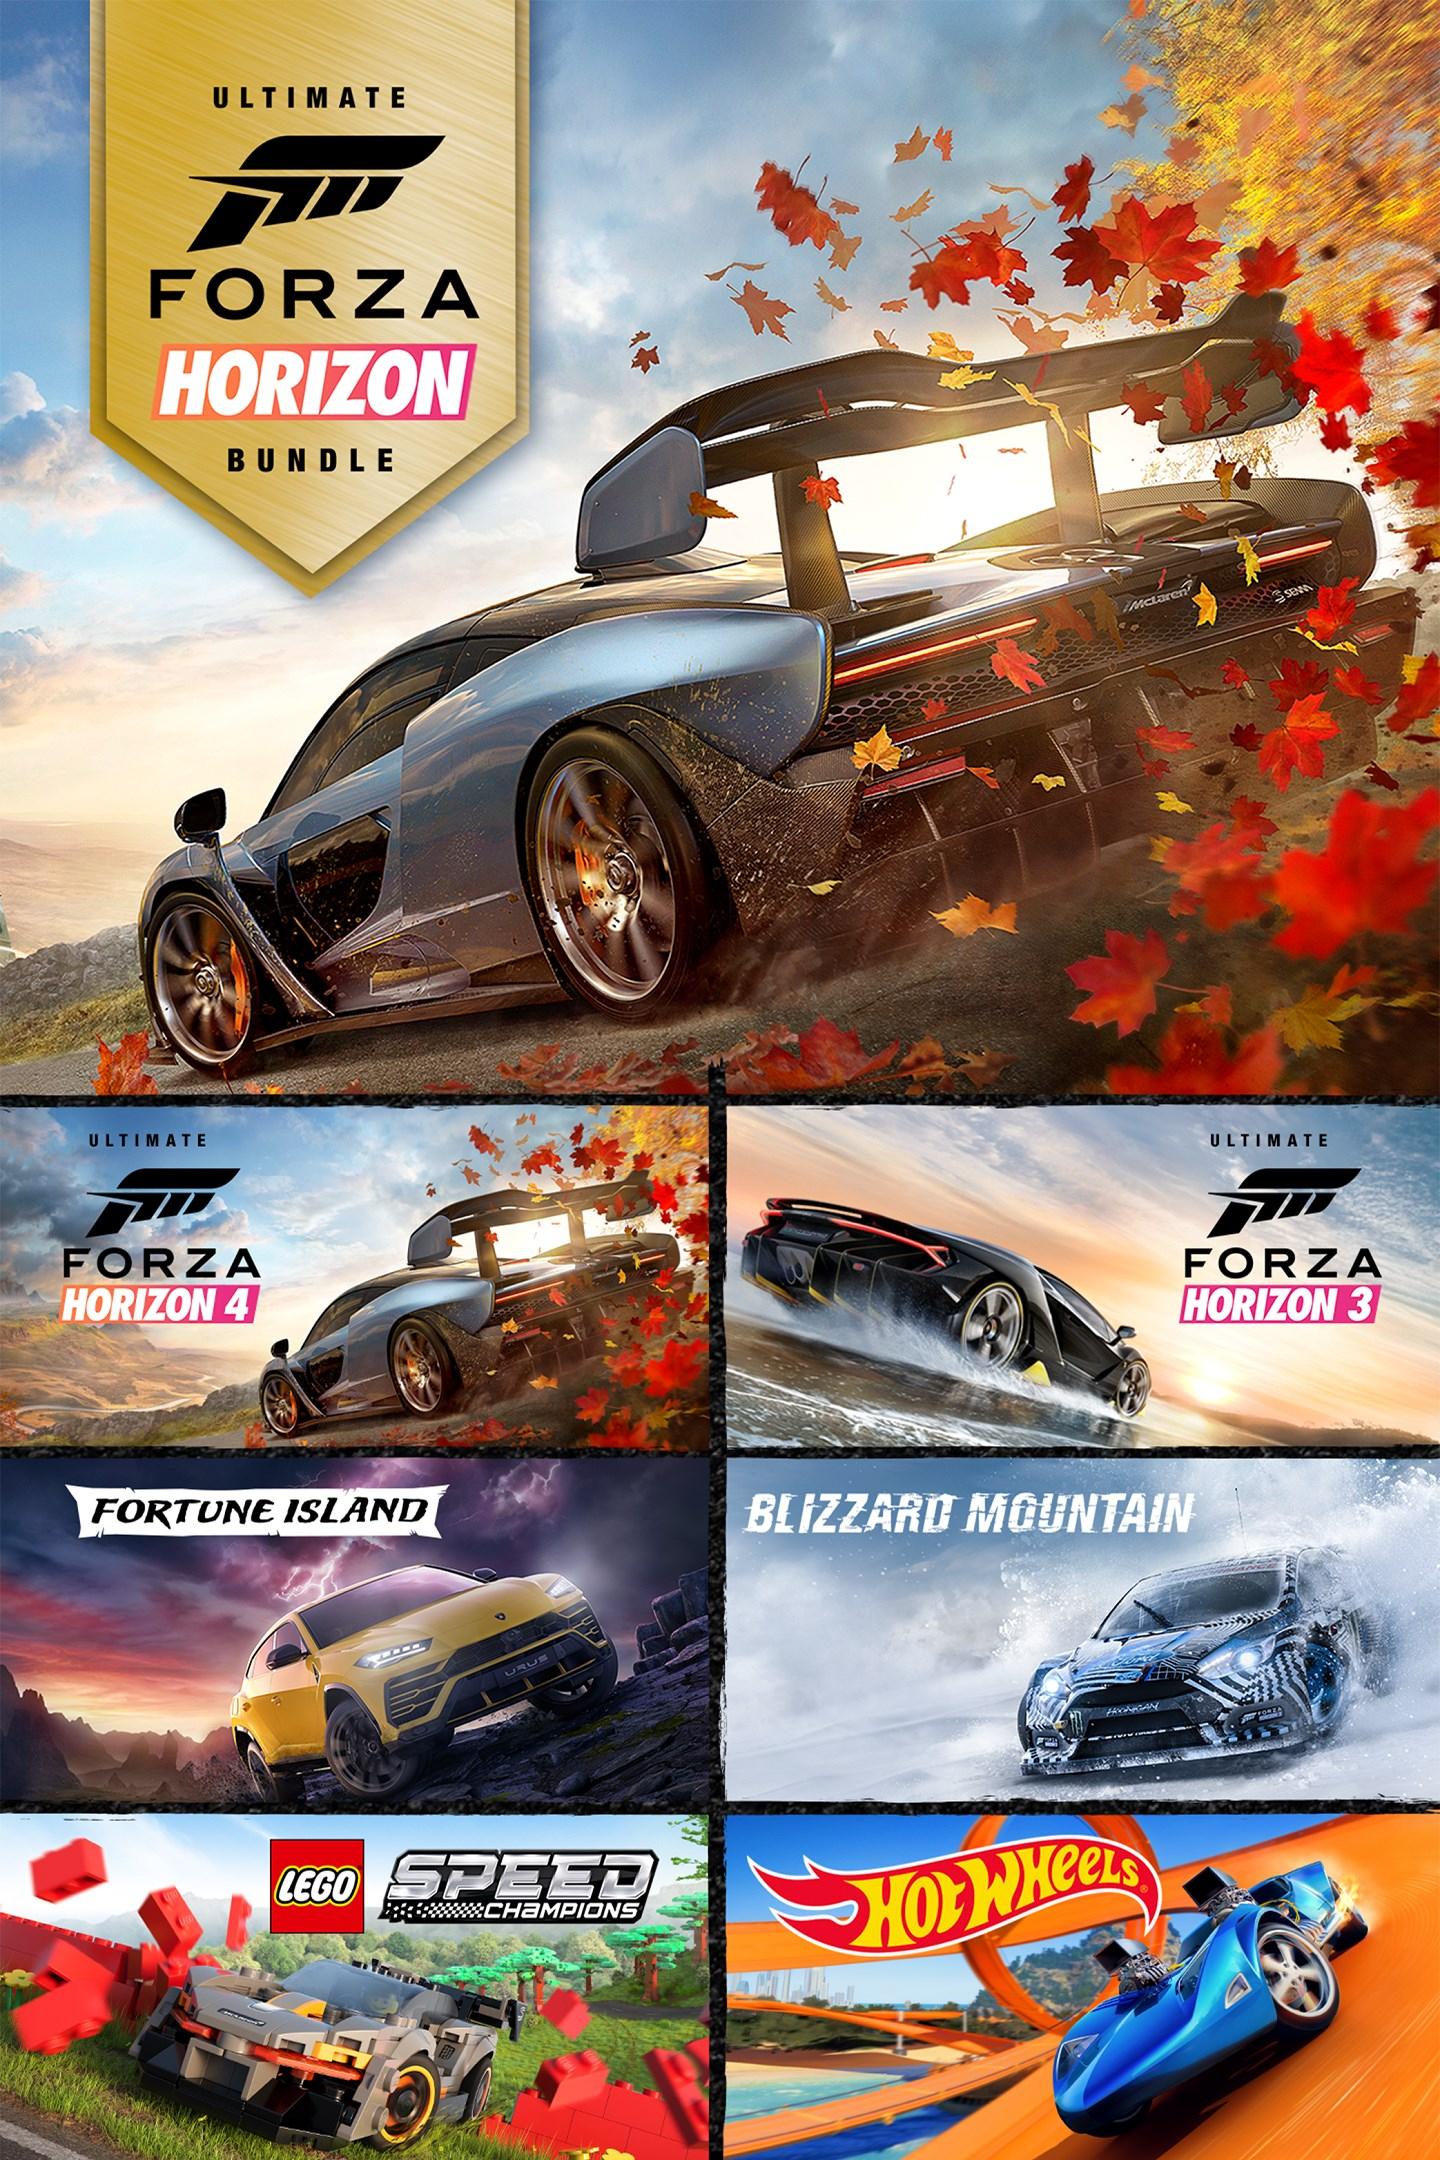 Forza Horizon 4 and Forza Horizon 3 Ultimate Editions Bundle £48.99 @ Xbox Store